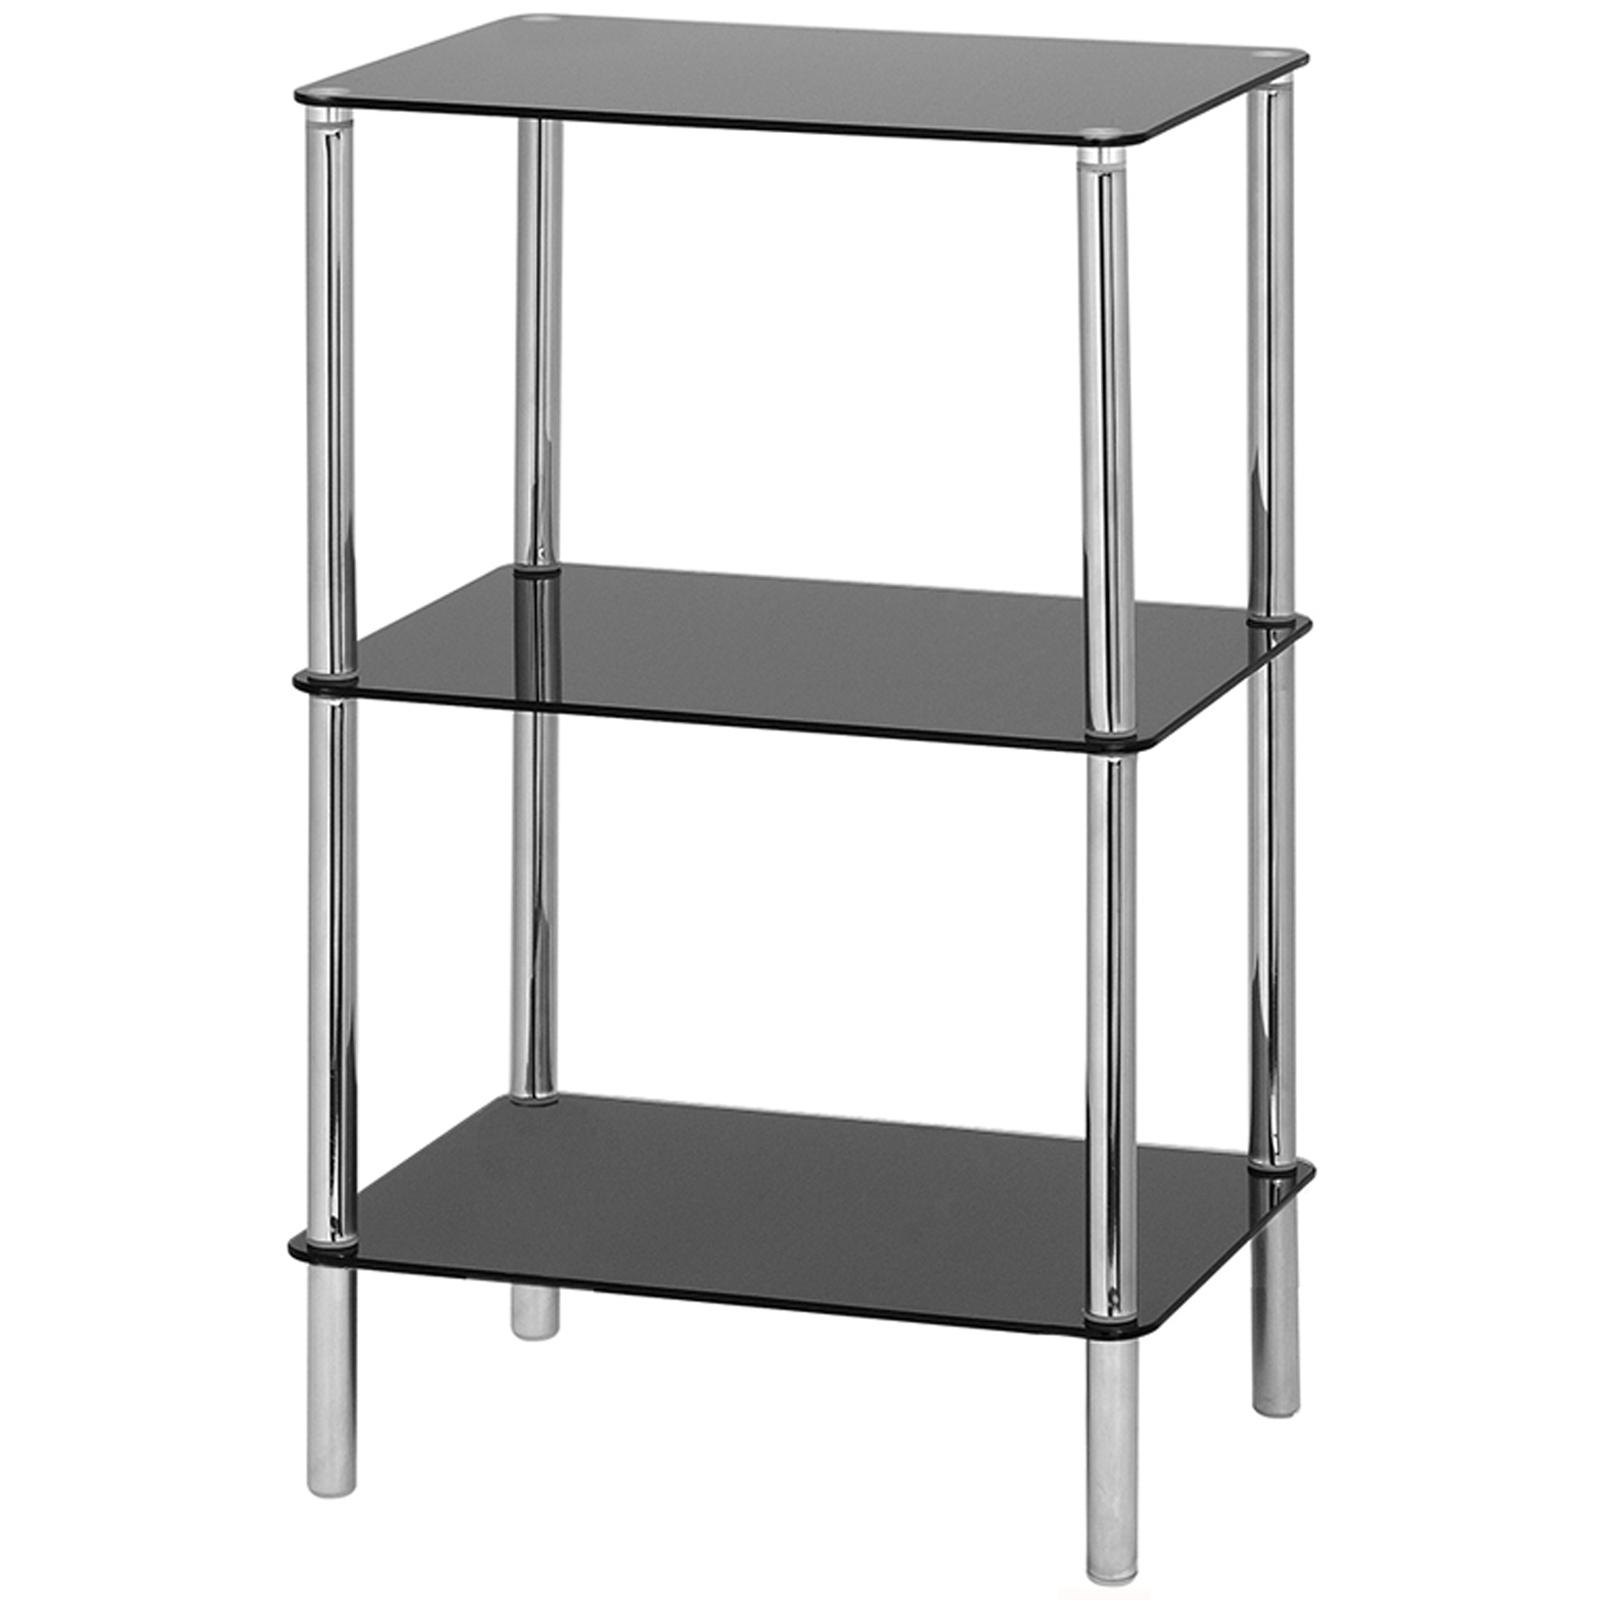 Hartleys Glass Side/End Table - 3 Tier - Black